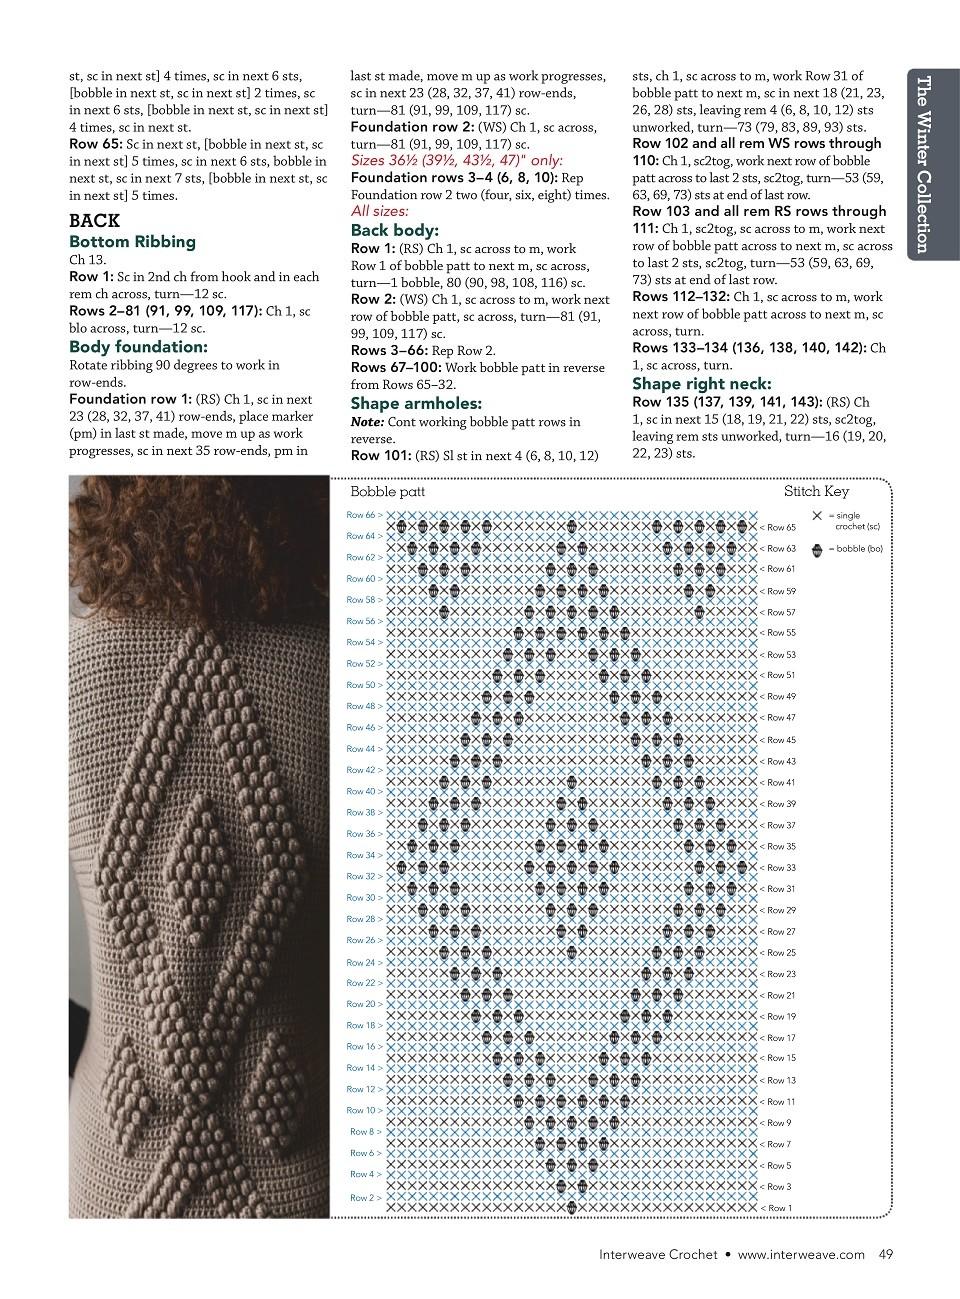 Interweave Crochet Winter 2019-50